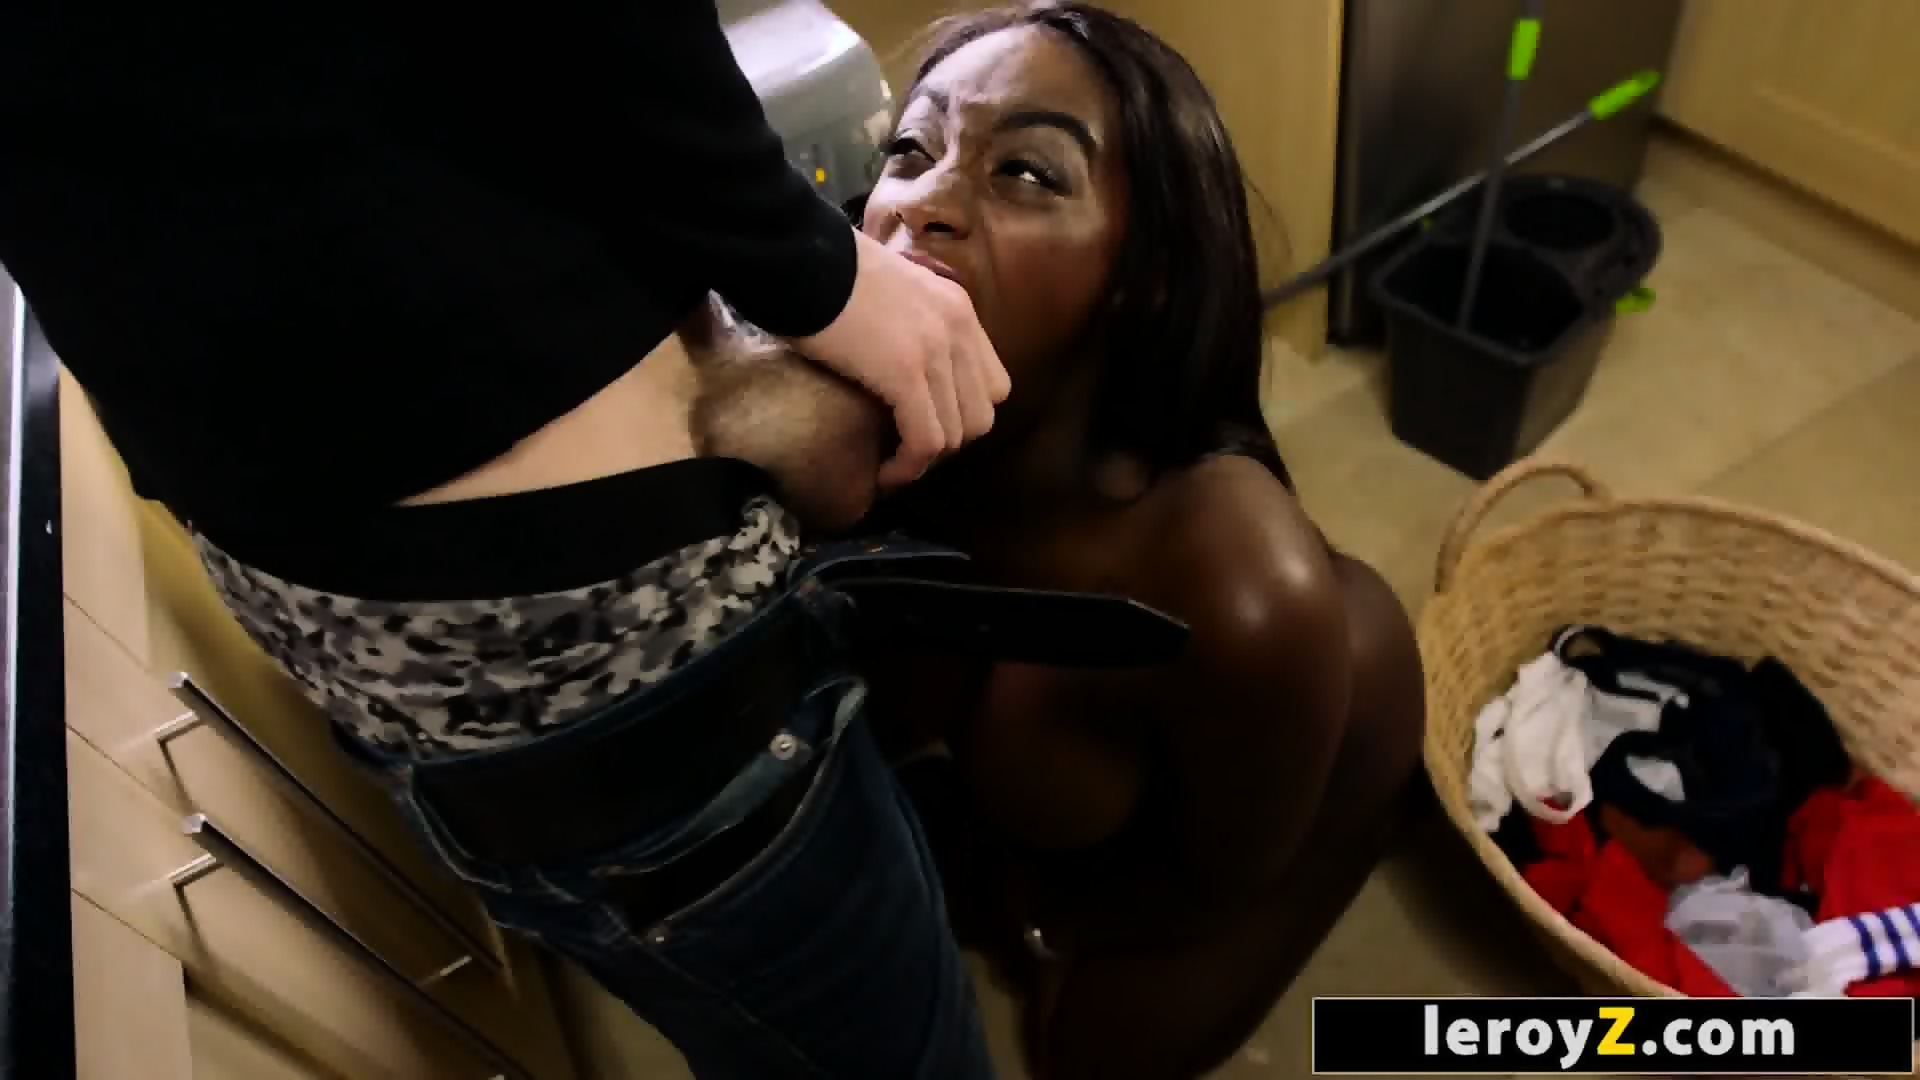 Ebony Sucking Big White Dick - Ebony pornstar Jai James Sucking a Big White Cock - EPORNER